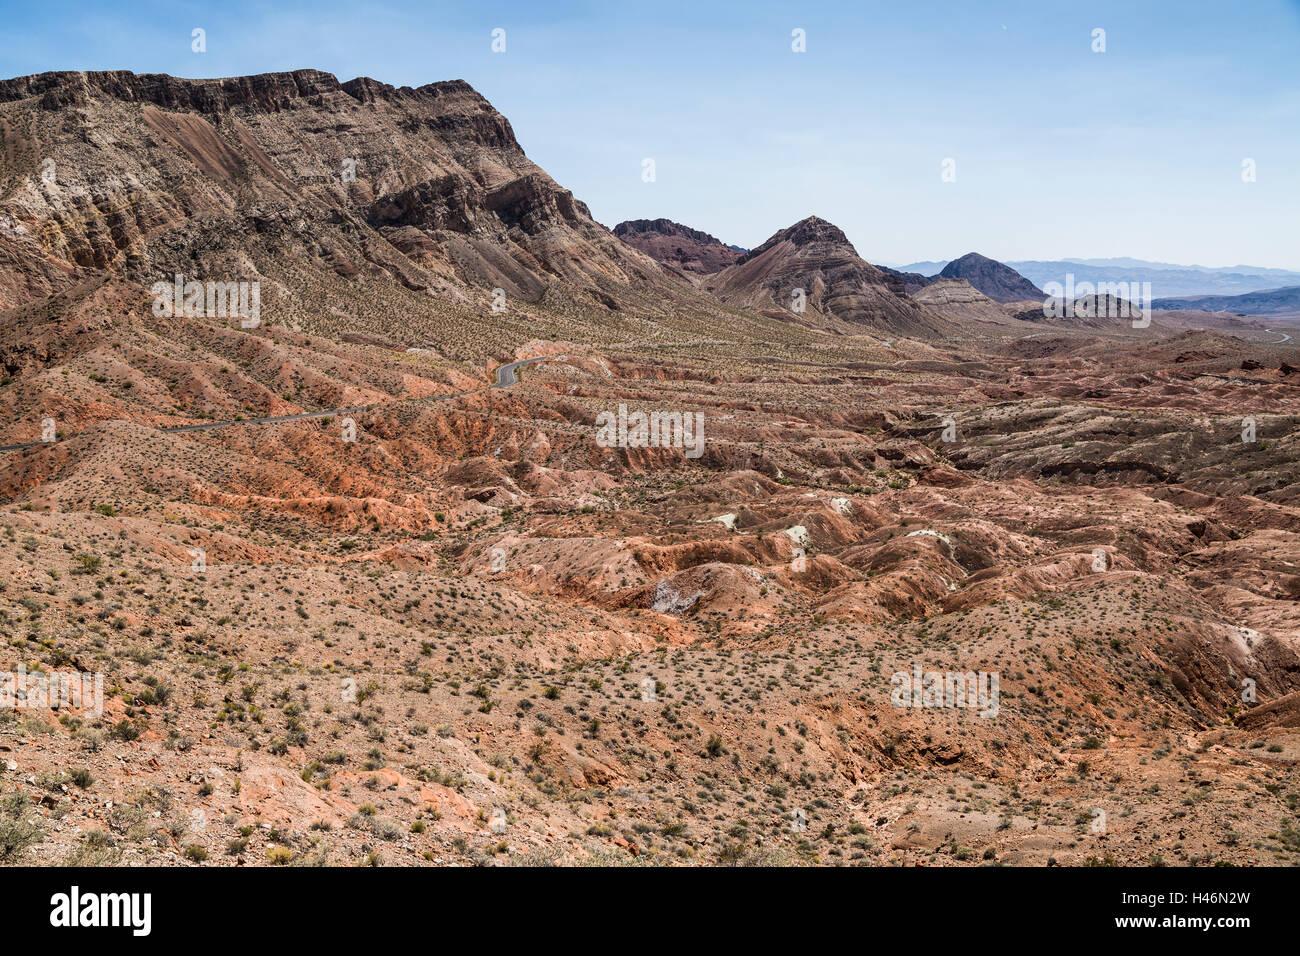 Mojave Desert, Mohave County, Nevada, USA - Stock Image